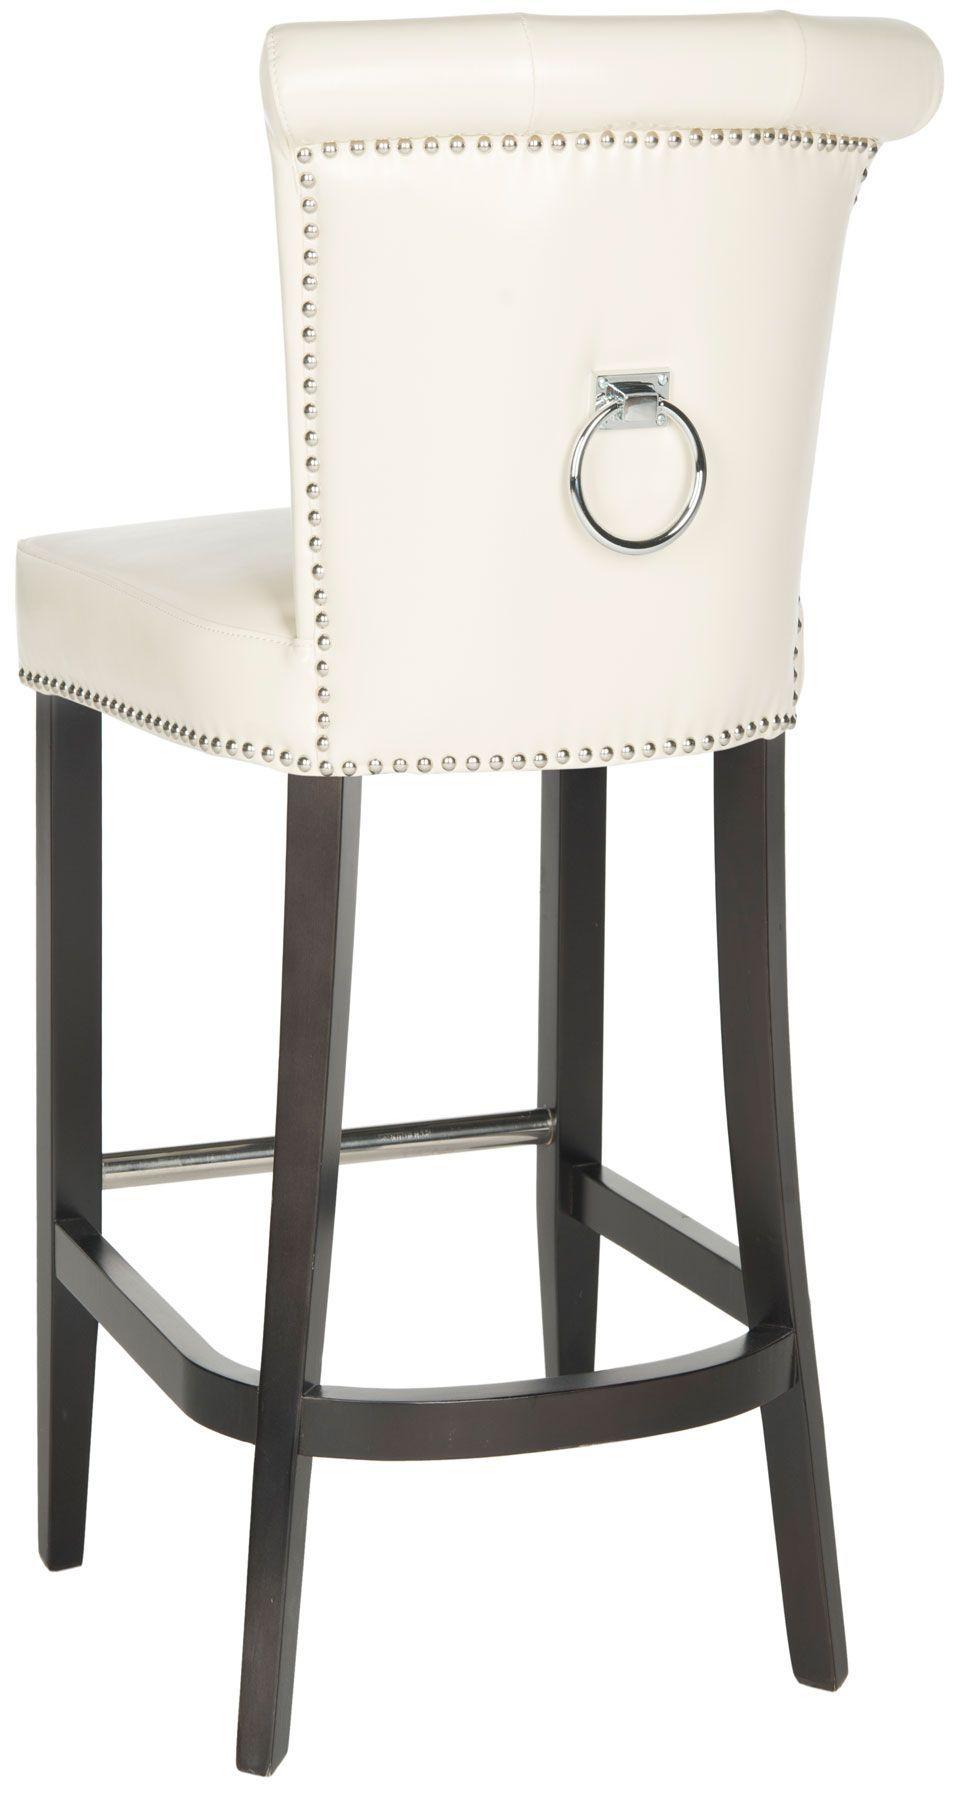 Pin On Furniture Design Unique